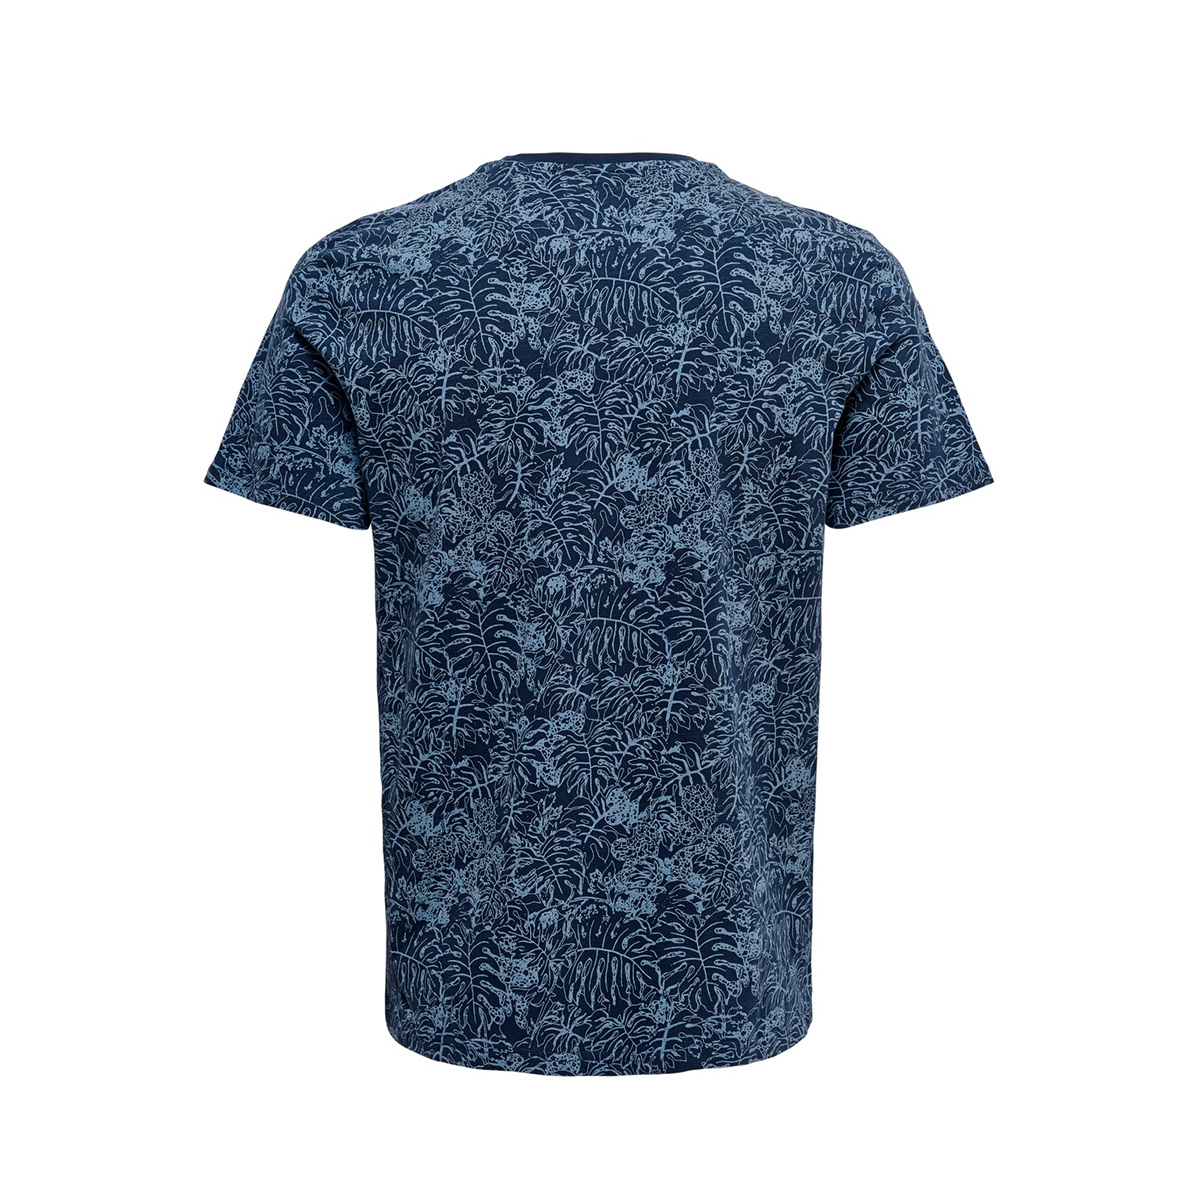 onscaj life slim aop  tee nf 6209 22016209 only & sons t-shirt dress blues